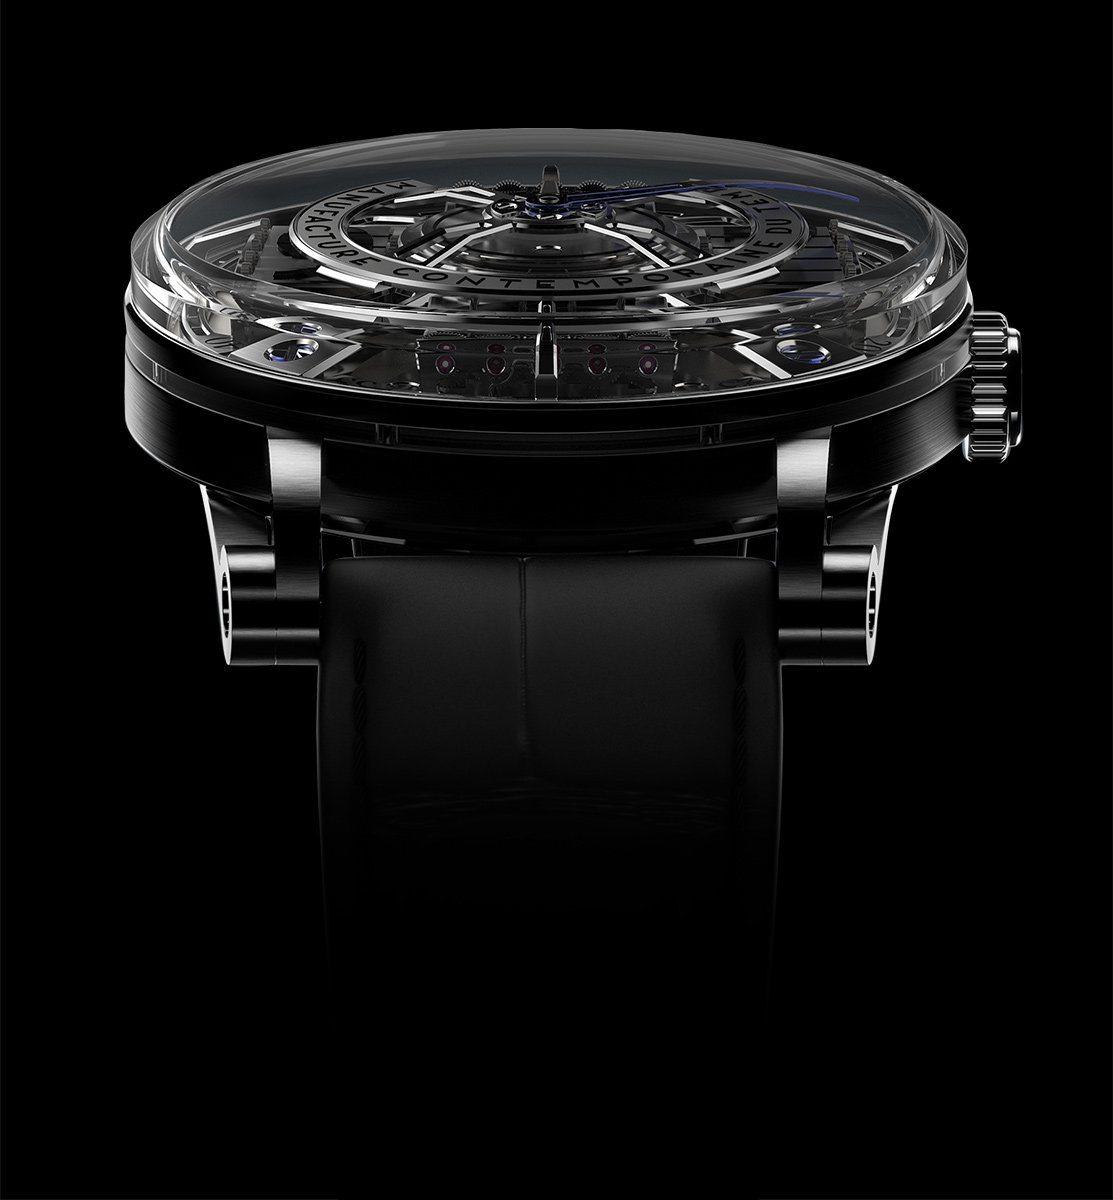 MCT_S210_reloj_The_Luxury_Trends